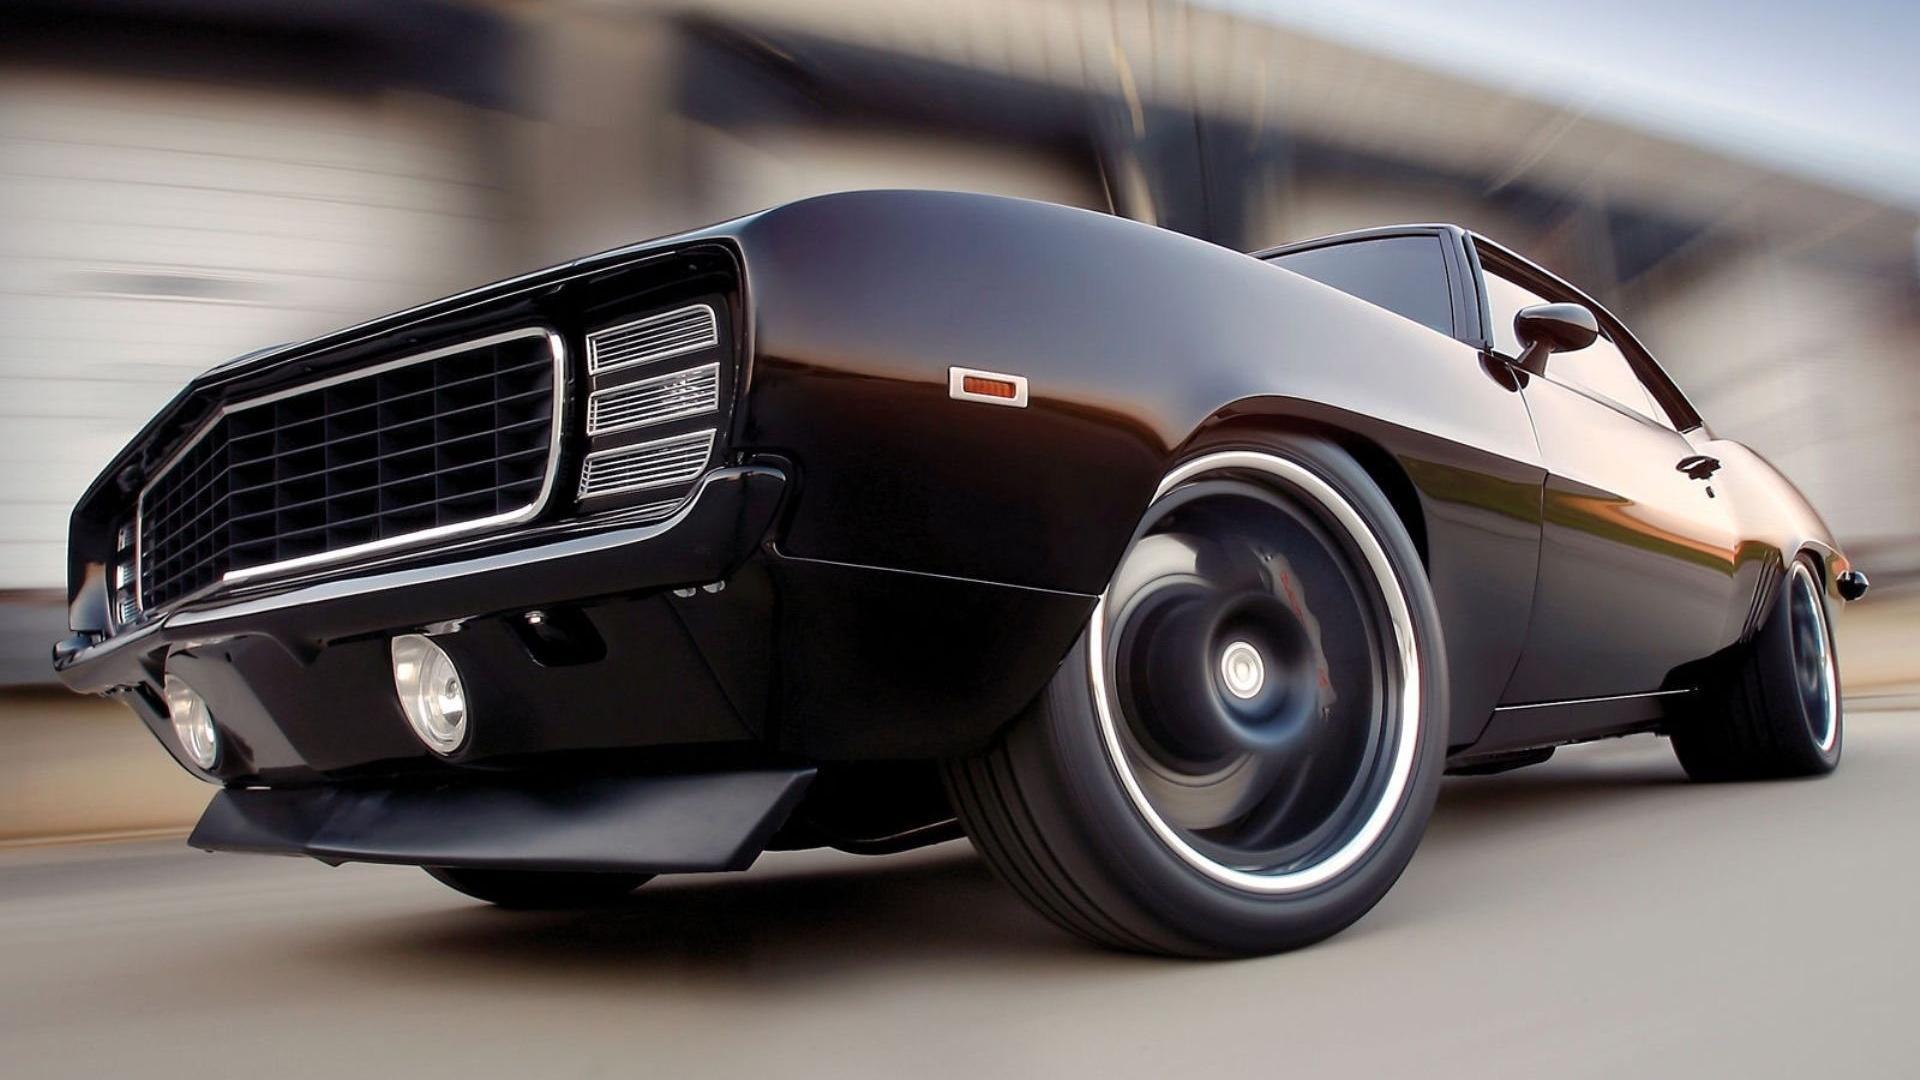 car wallpaper chevrolet camaro black 1080x1920 1920x1080